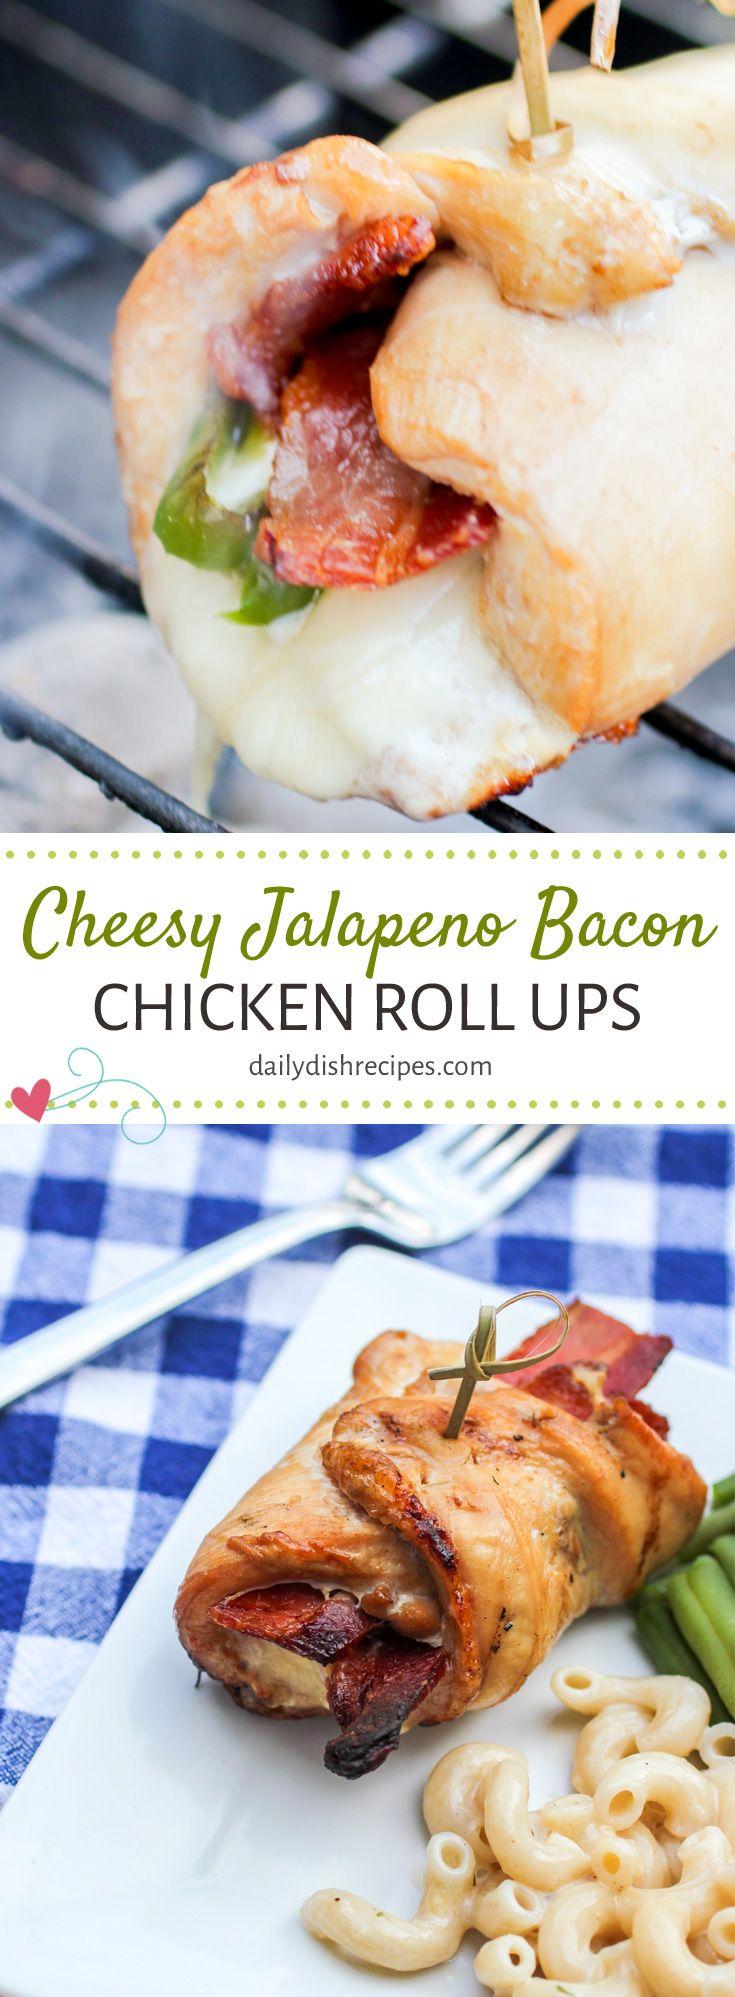 #ad Cheesy Jalapeno Bacon Chicken Roll Ups via @da…